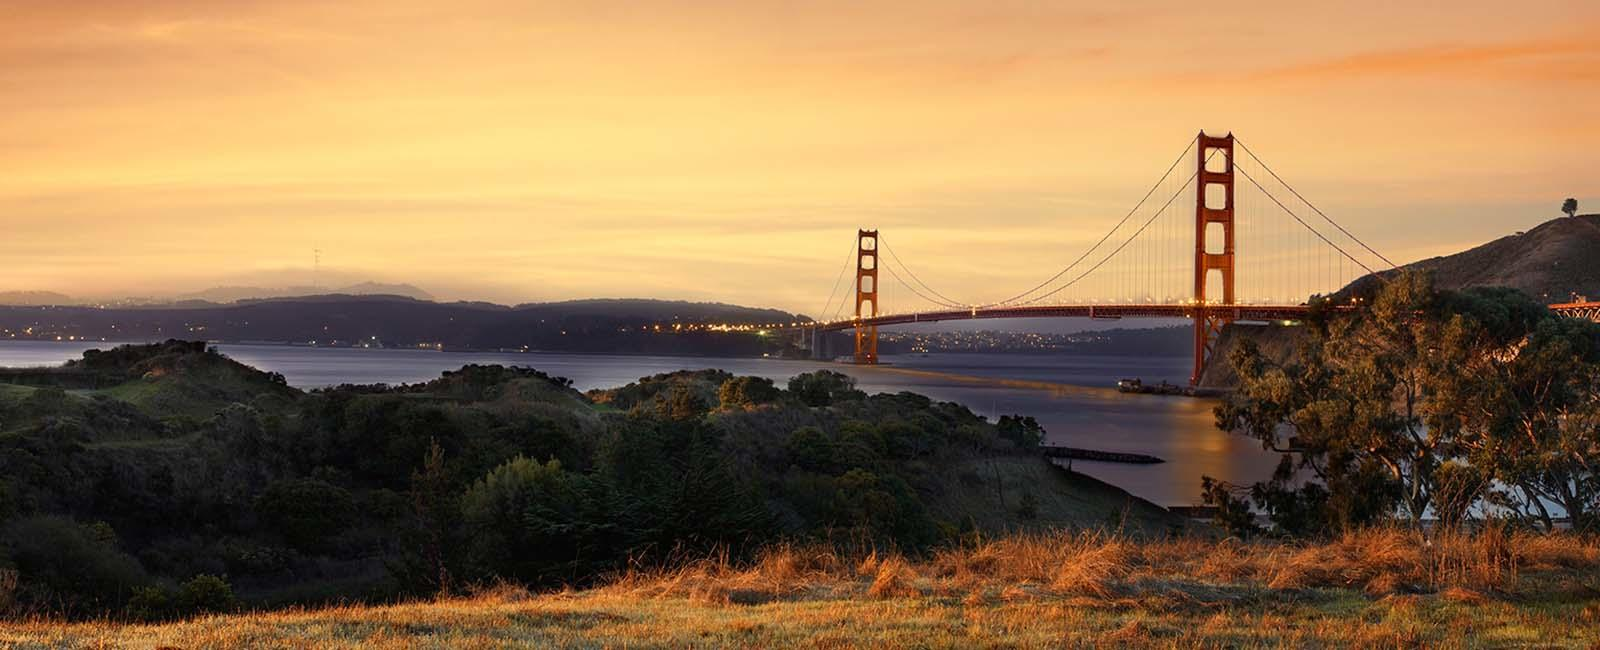 Golden Gate National Parks Conservancy Parks For All Forever